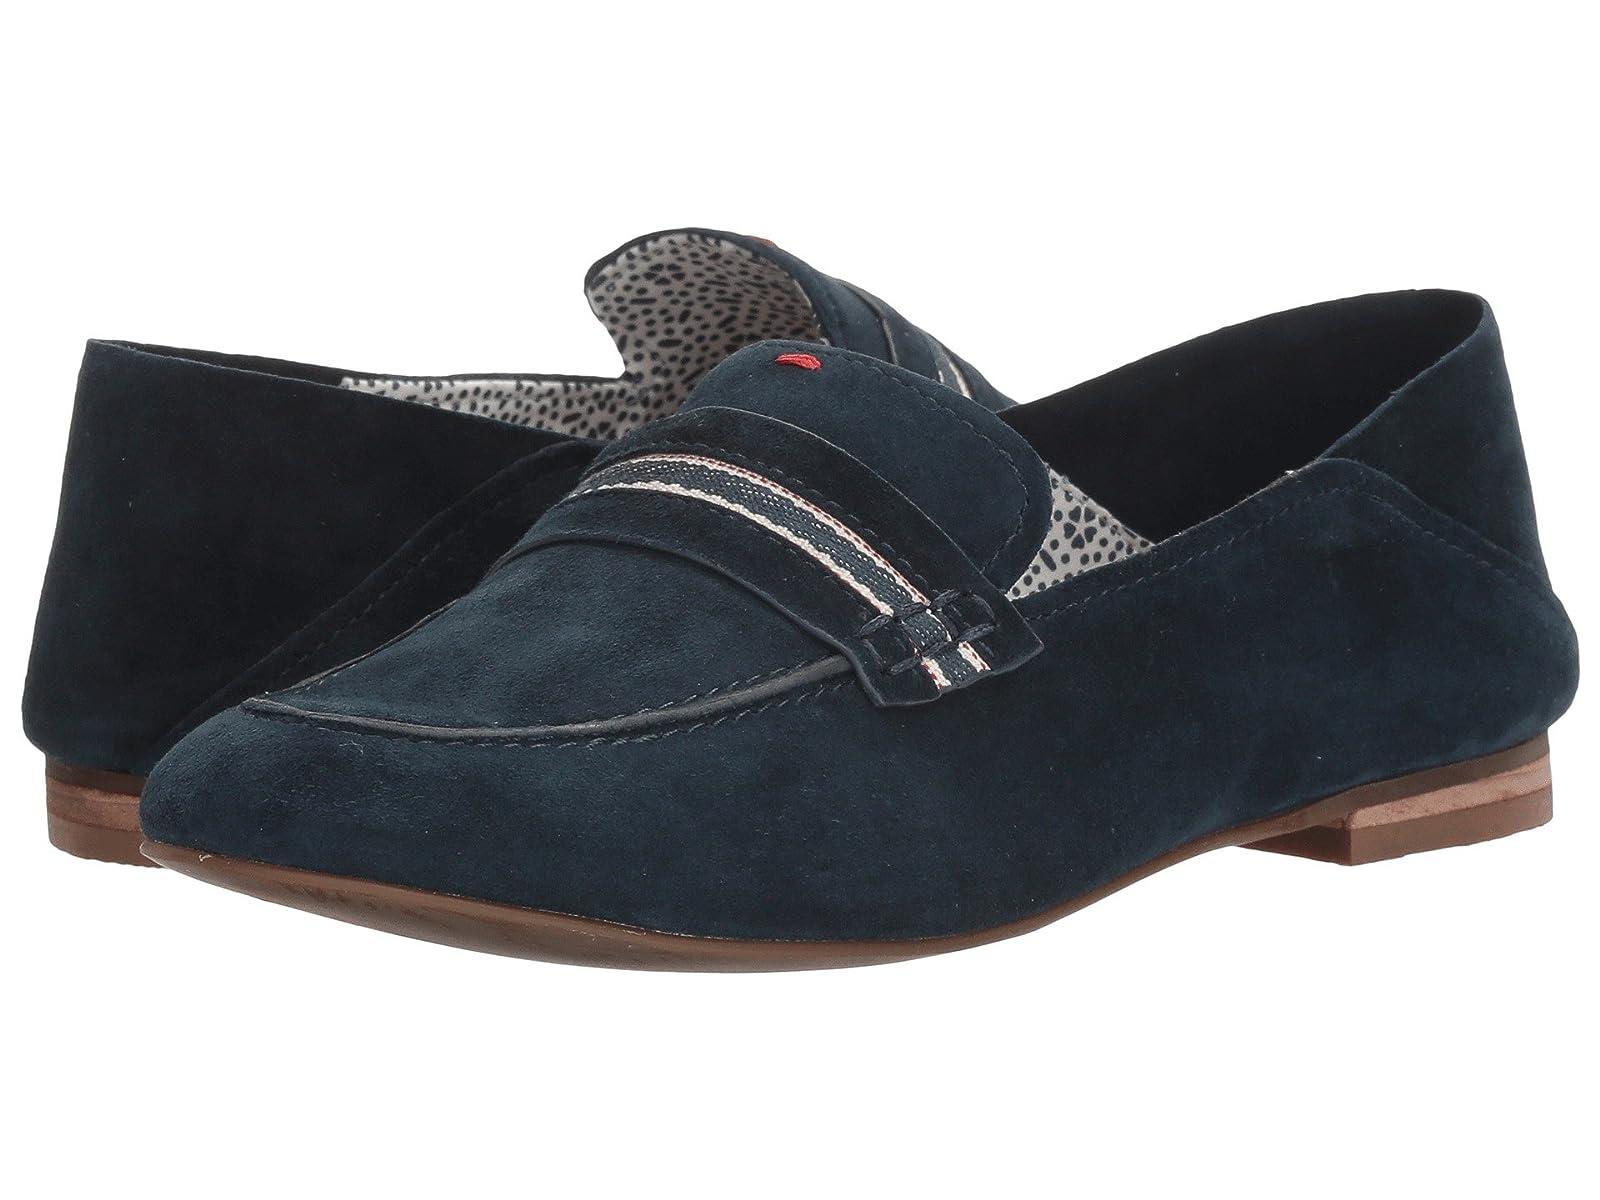 ED Ellen DeGeneres LatianaCheap and distinctive eye-catching shoes